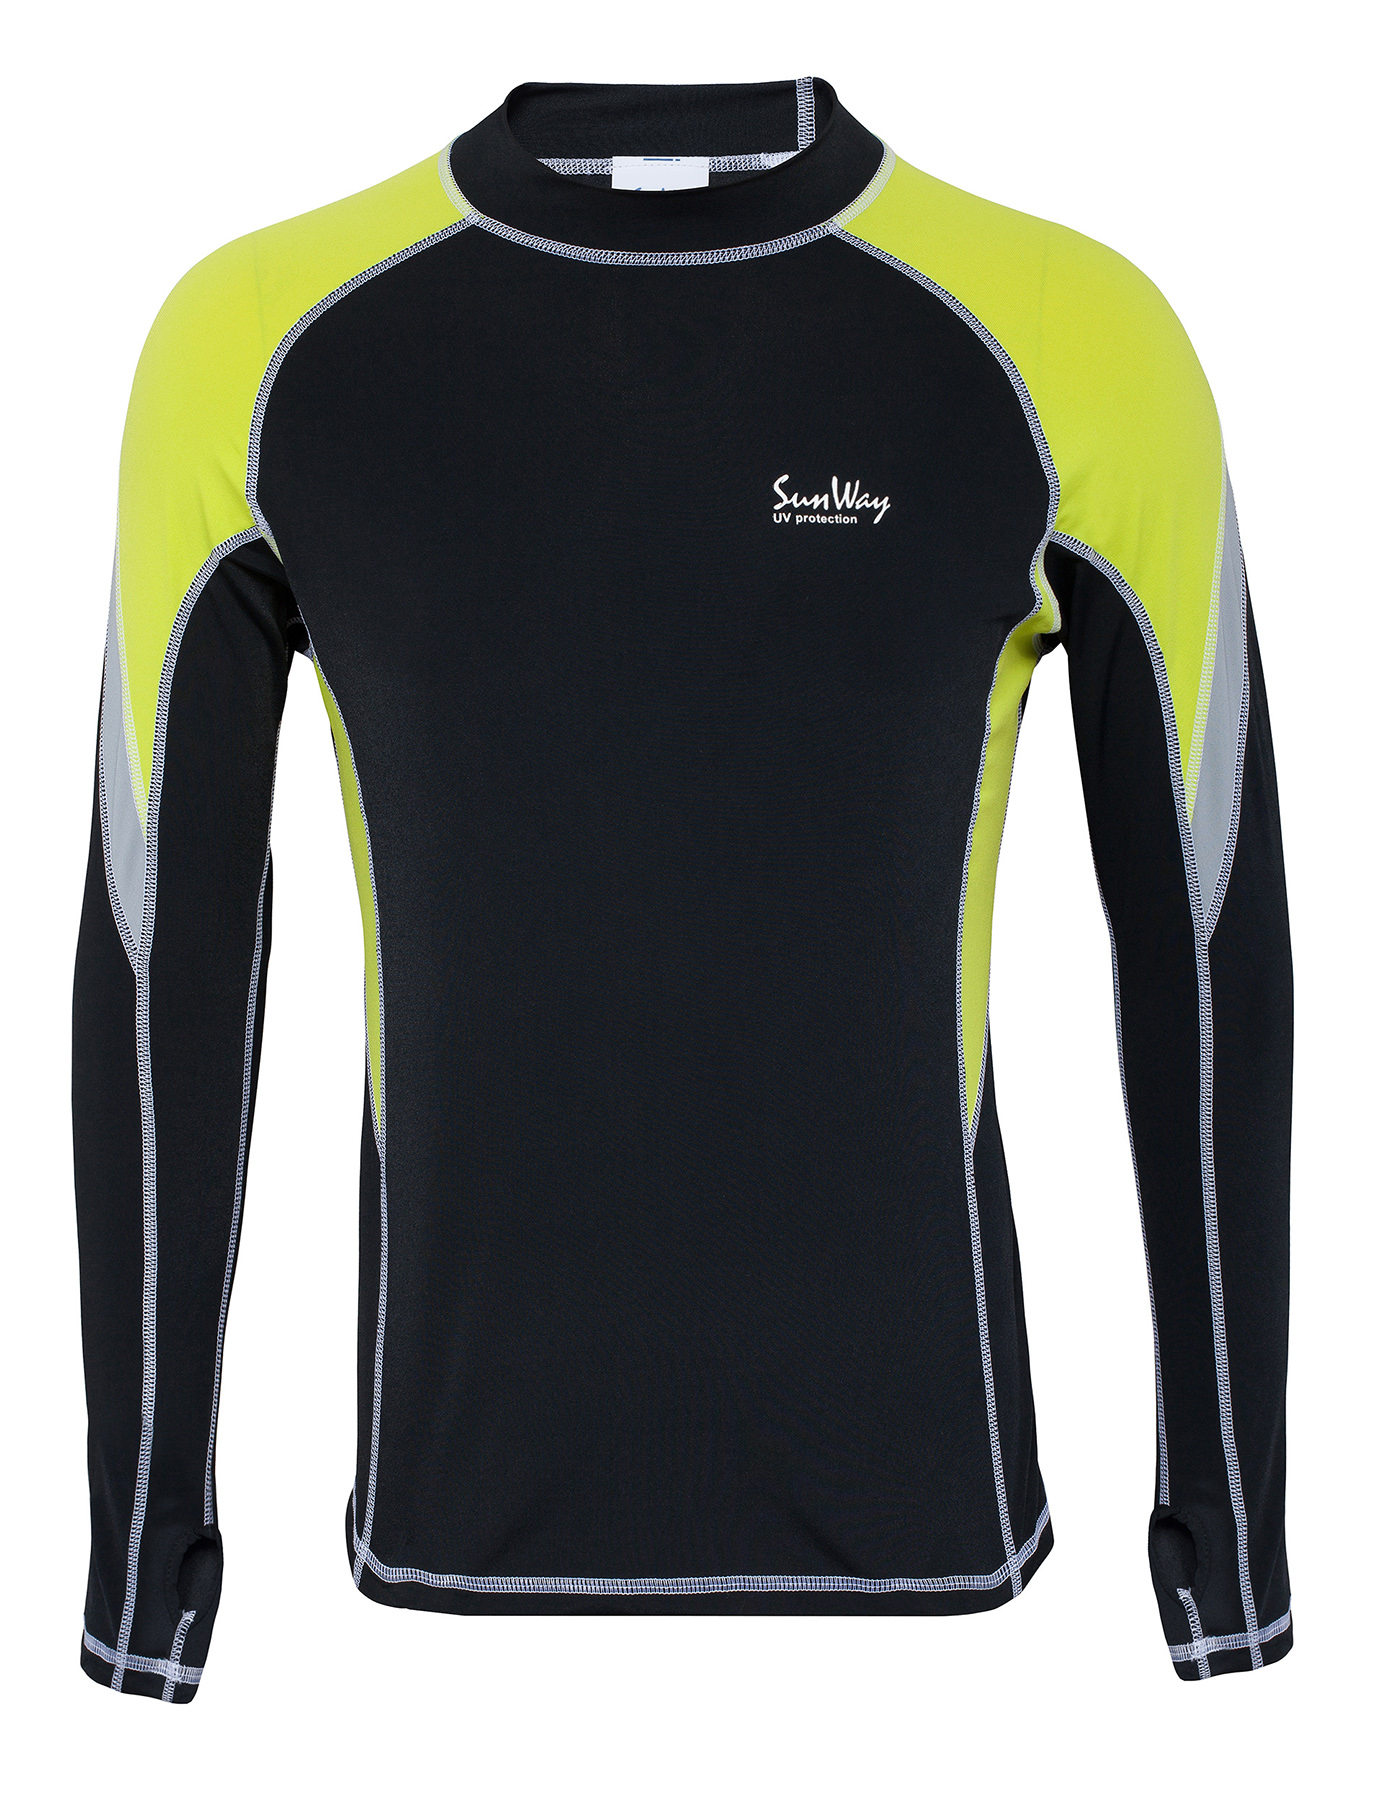 Upf50 Long Sleeves Rash Guard Shirt